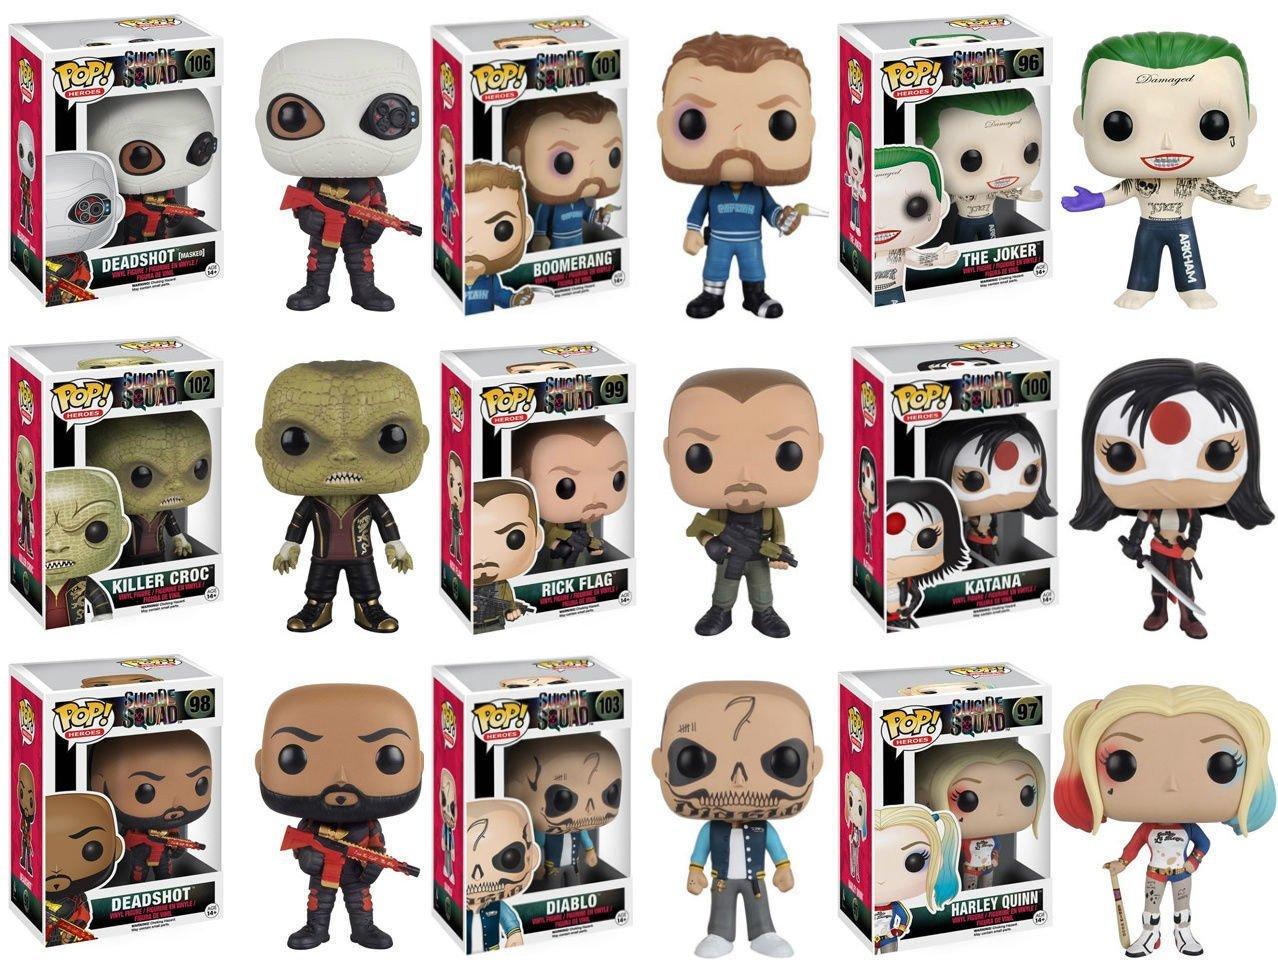 Funko POP Movies/Heroes: Suicide Squad Complete Set of 9 - Deadshot [Unmasked], Diablo, Katana, Killer Croc, Boomerang, Rick Flag, The Joker, Harley Quinn, Deadshot [Masked]